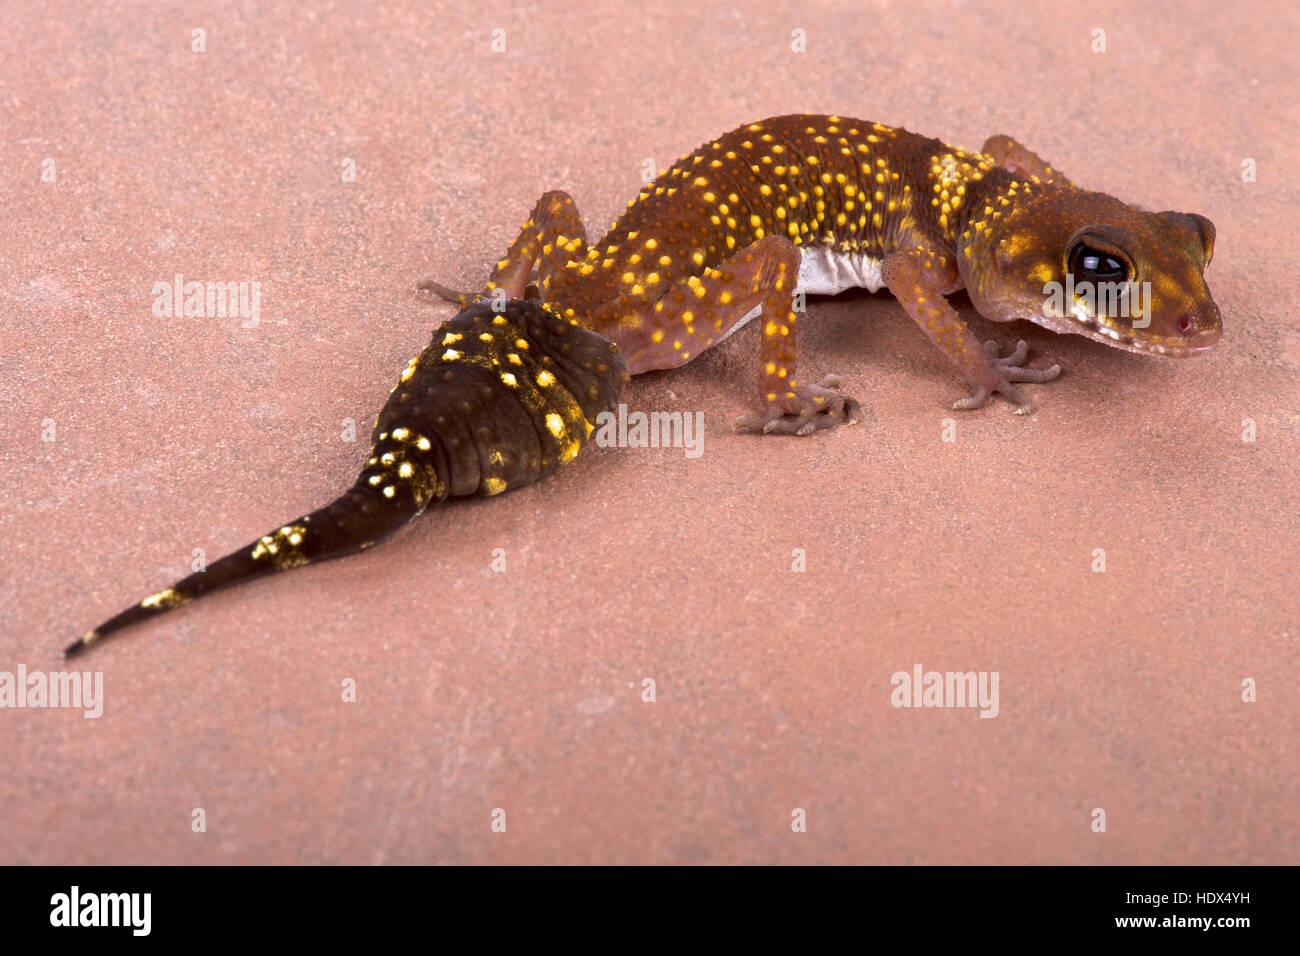 Western thick-tailed gecko, Underwoodisaurus milii - Stock Image